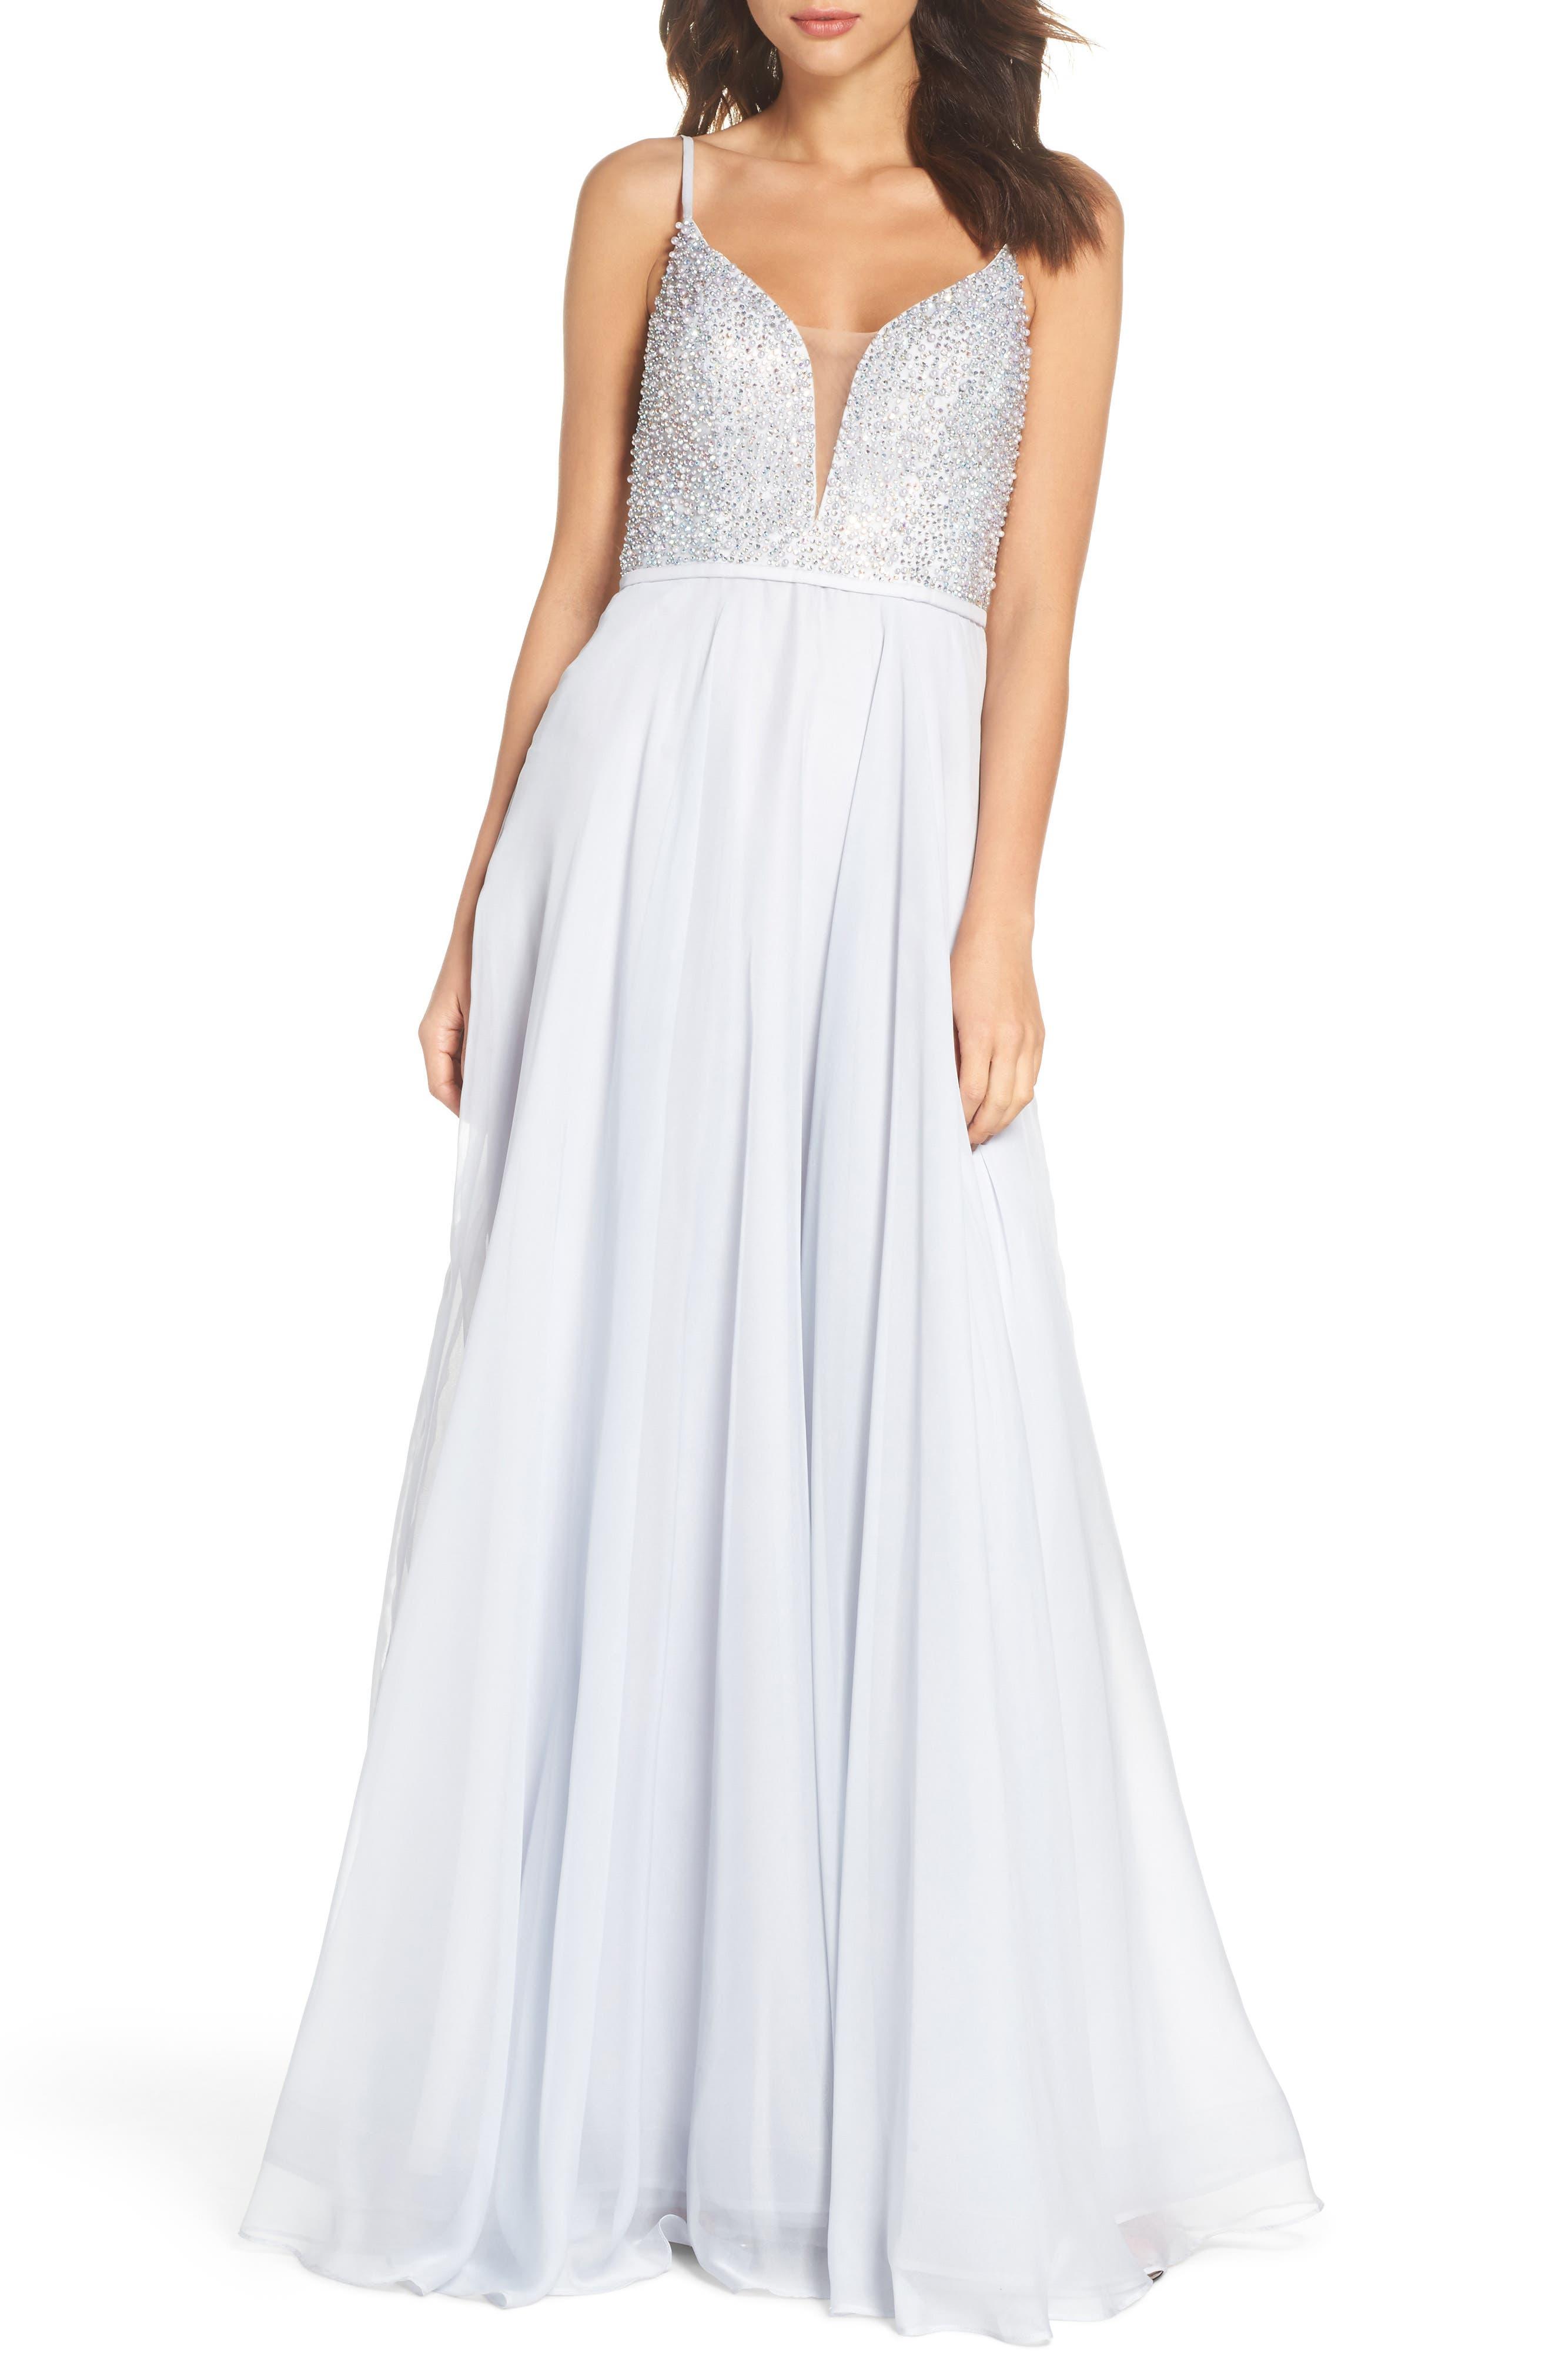 Beaded Chiffon Gown,                             Main thumbnail 1, color,                             040